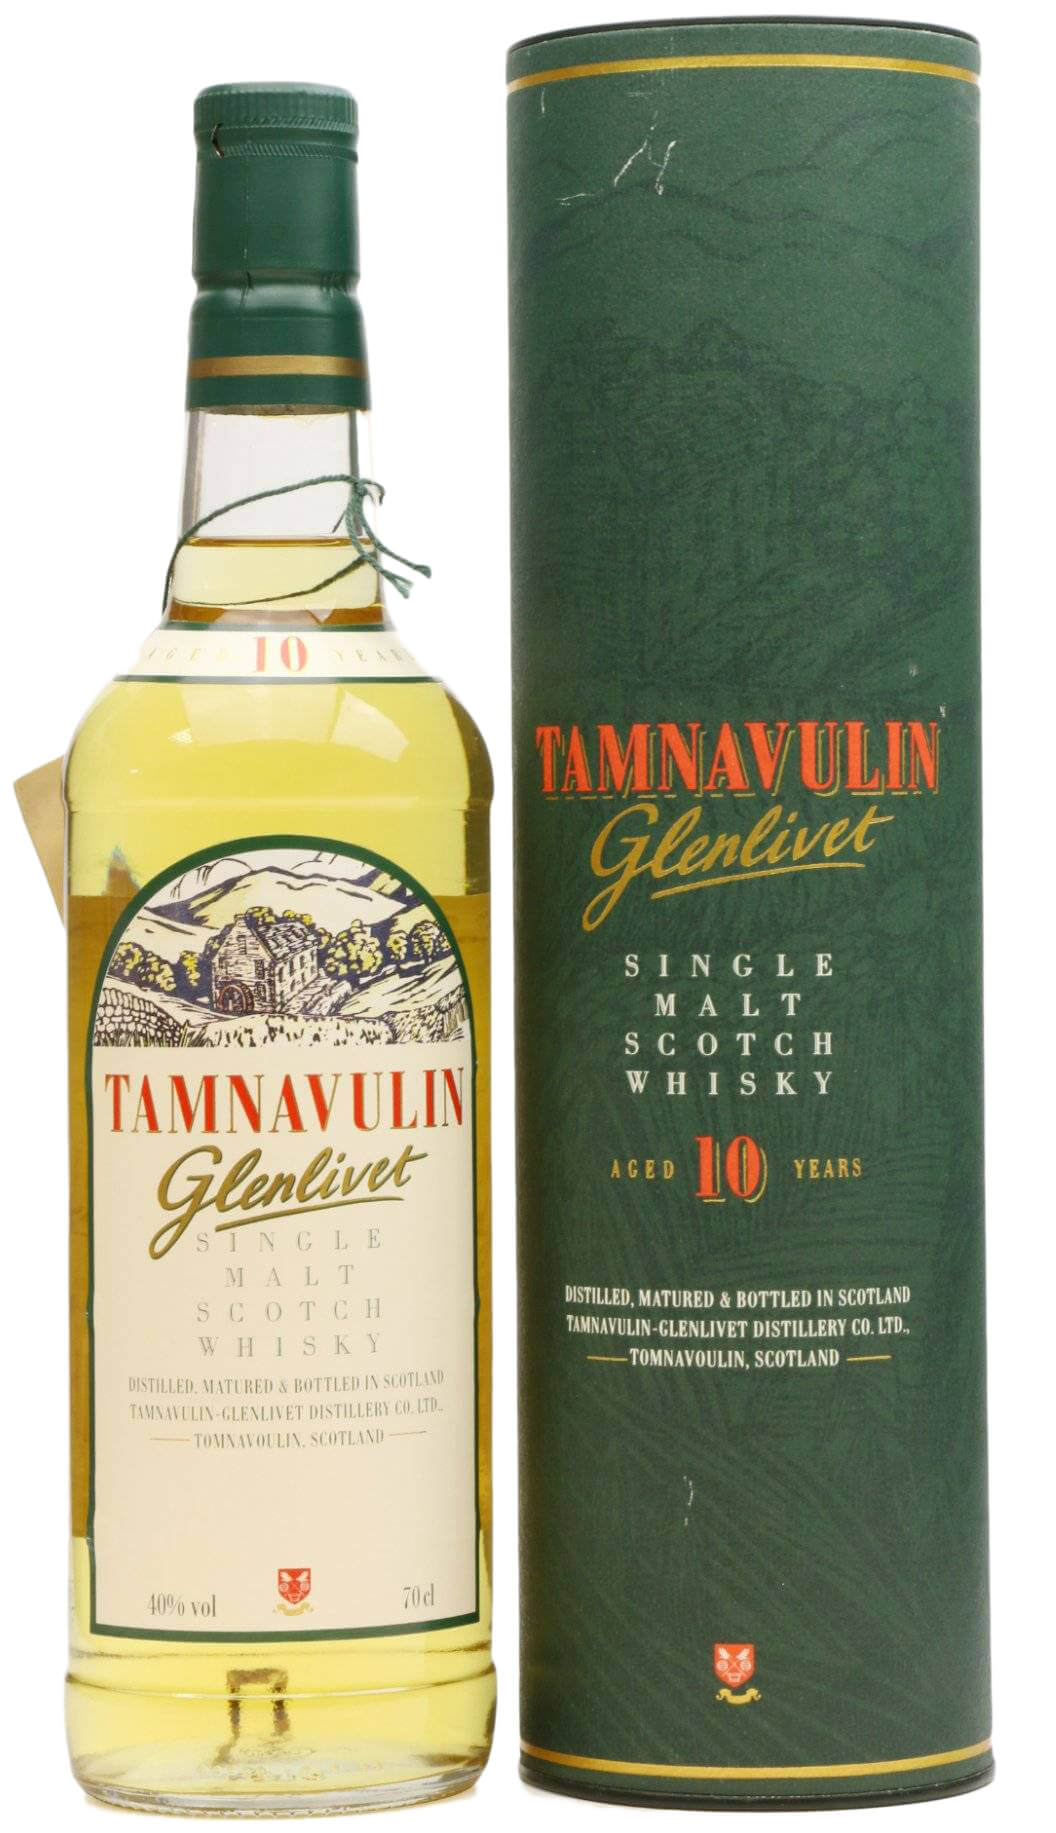 Tamnavulin Glenlivet 10 Years Old фото